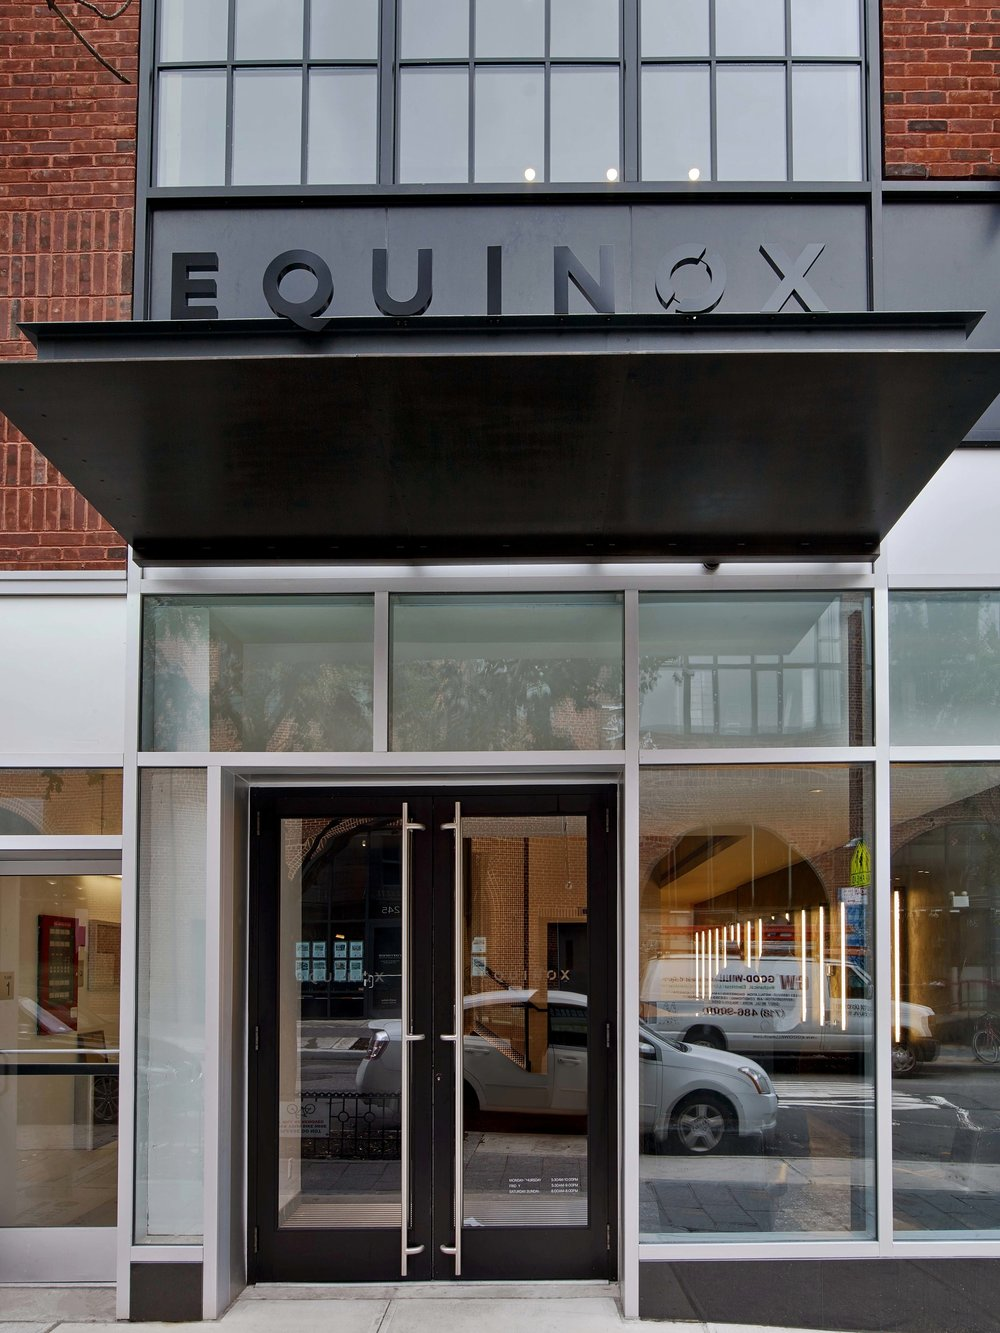 Equinox Williamsburg Exterior Door and Sign